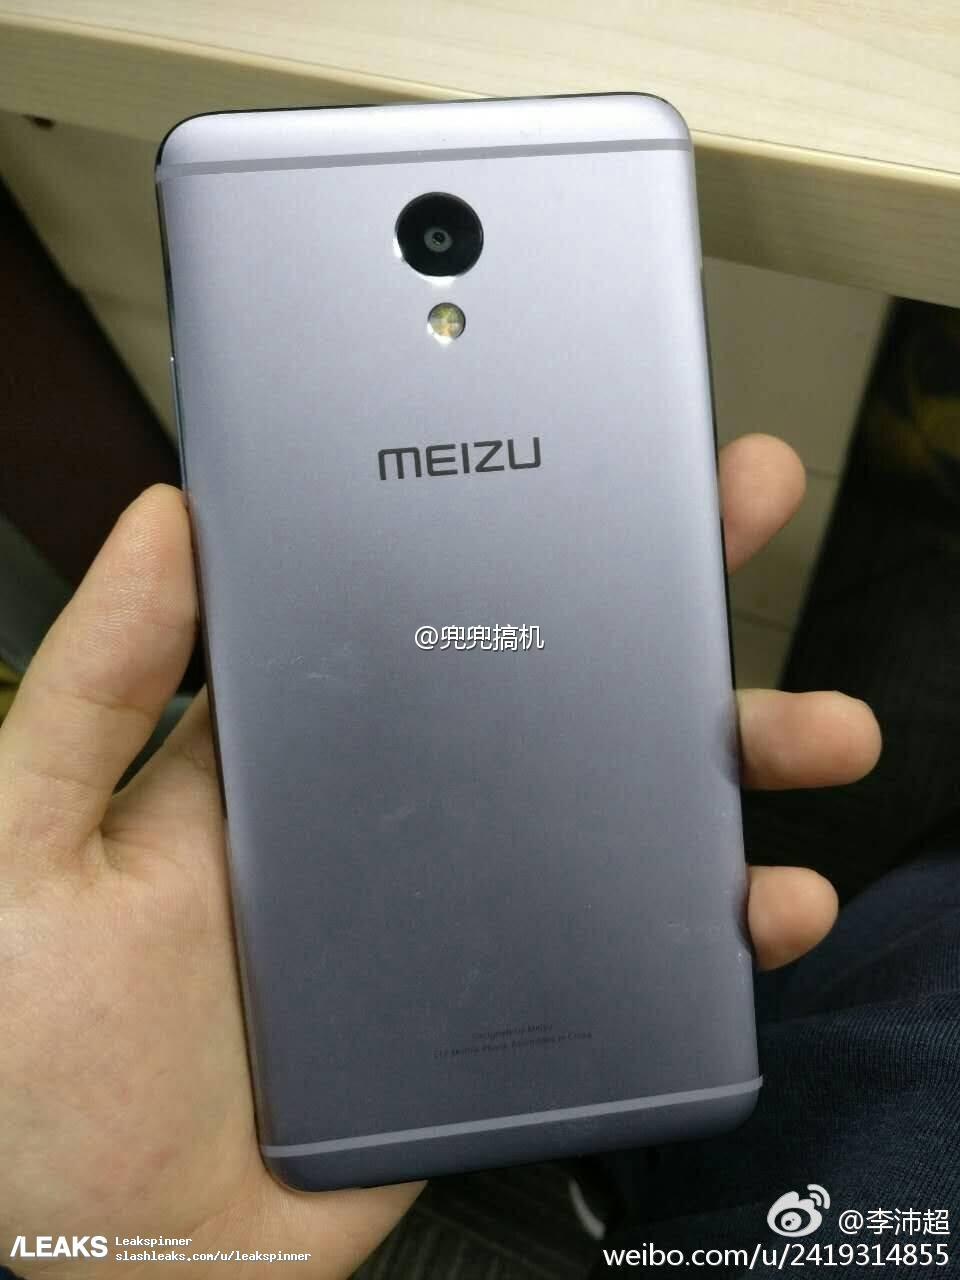 img Last minute leak shows Meizu M5 Note in the flesh